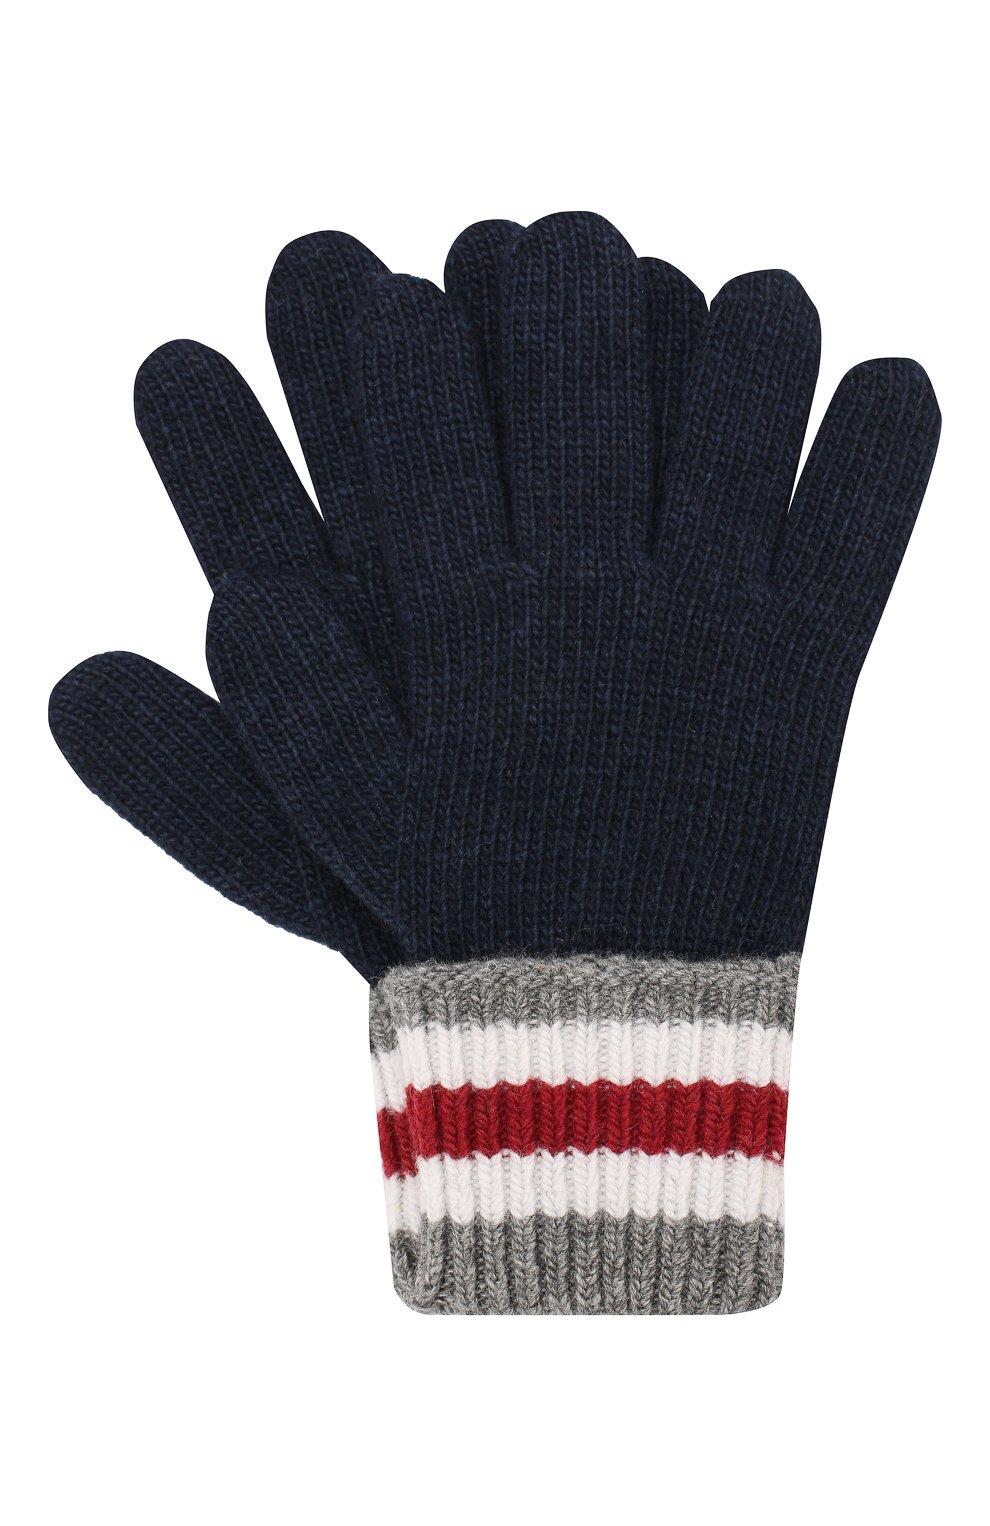 Детские перчатки DOLCE & GABBANA темно-синего цвета, арт. LBKA22/JAMC8 | Фото 1